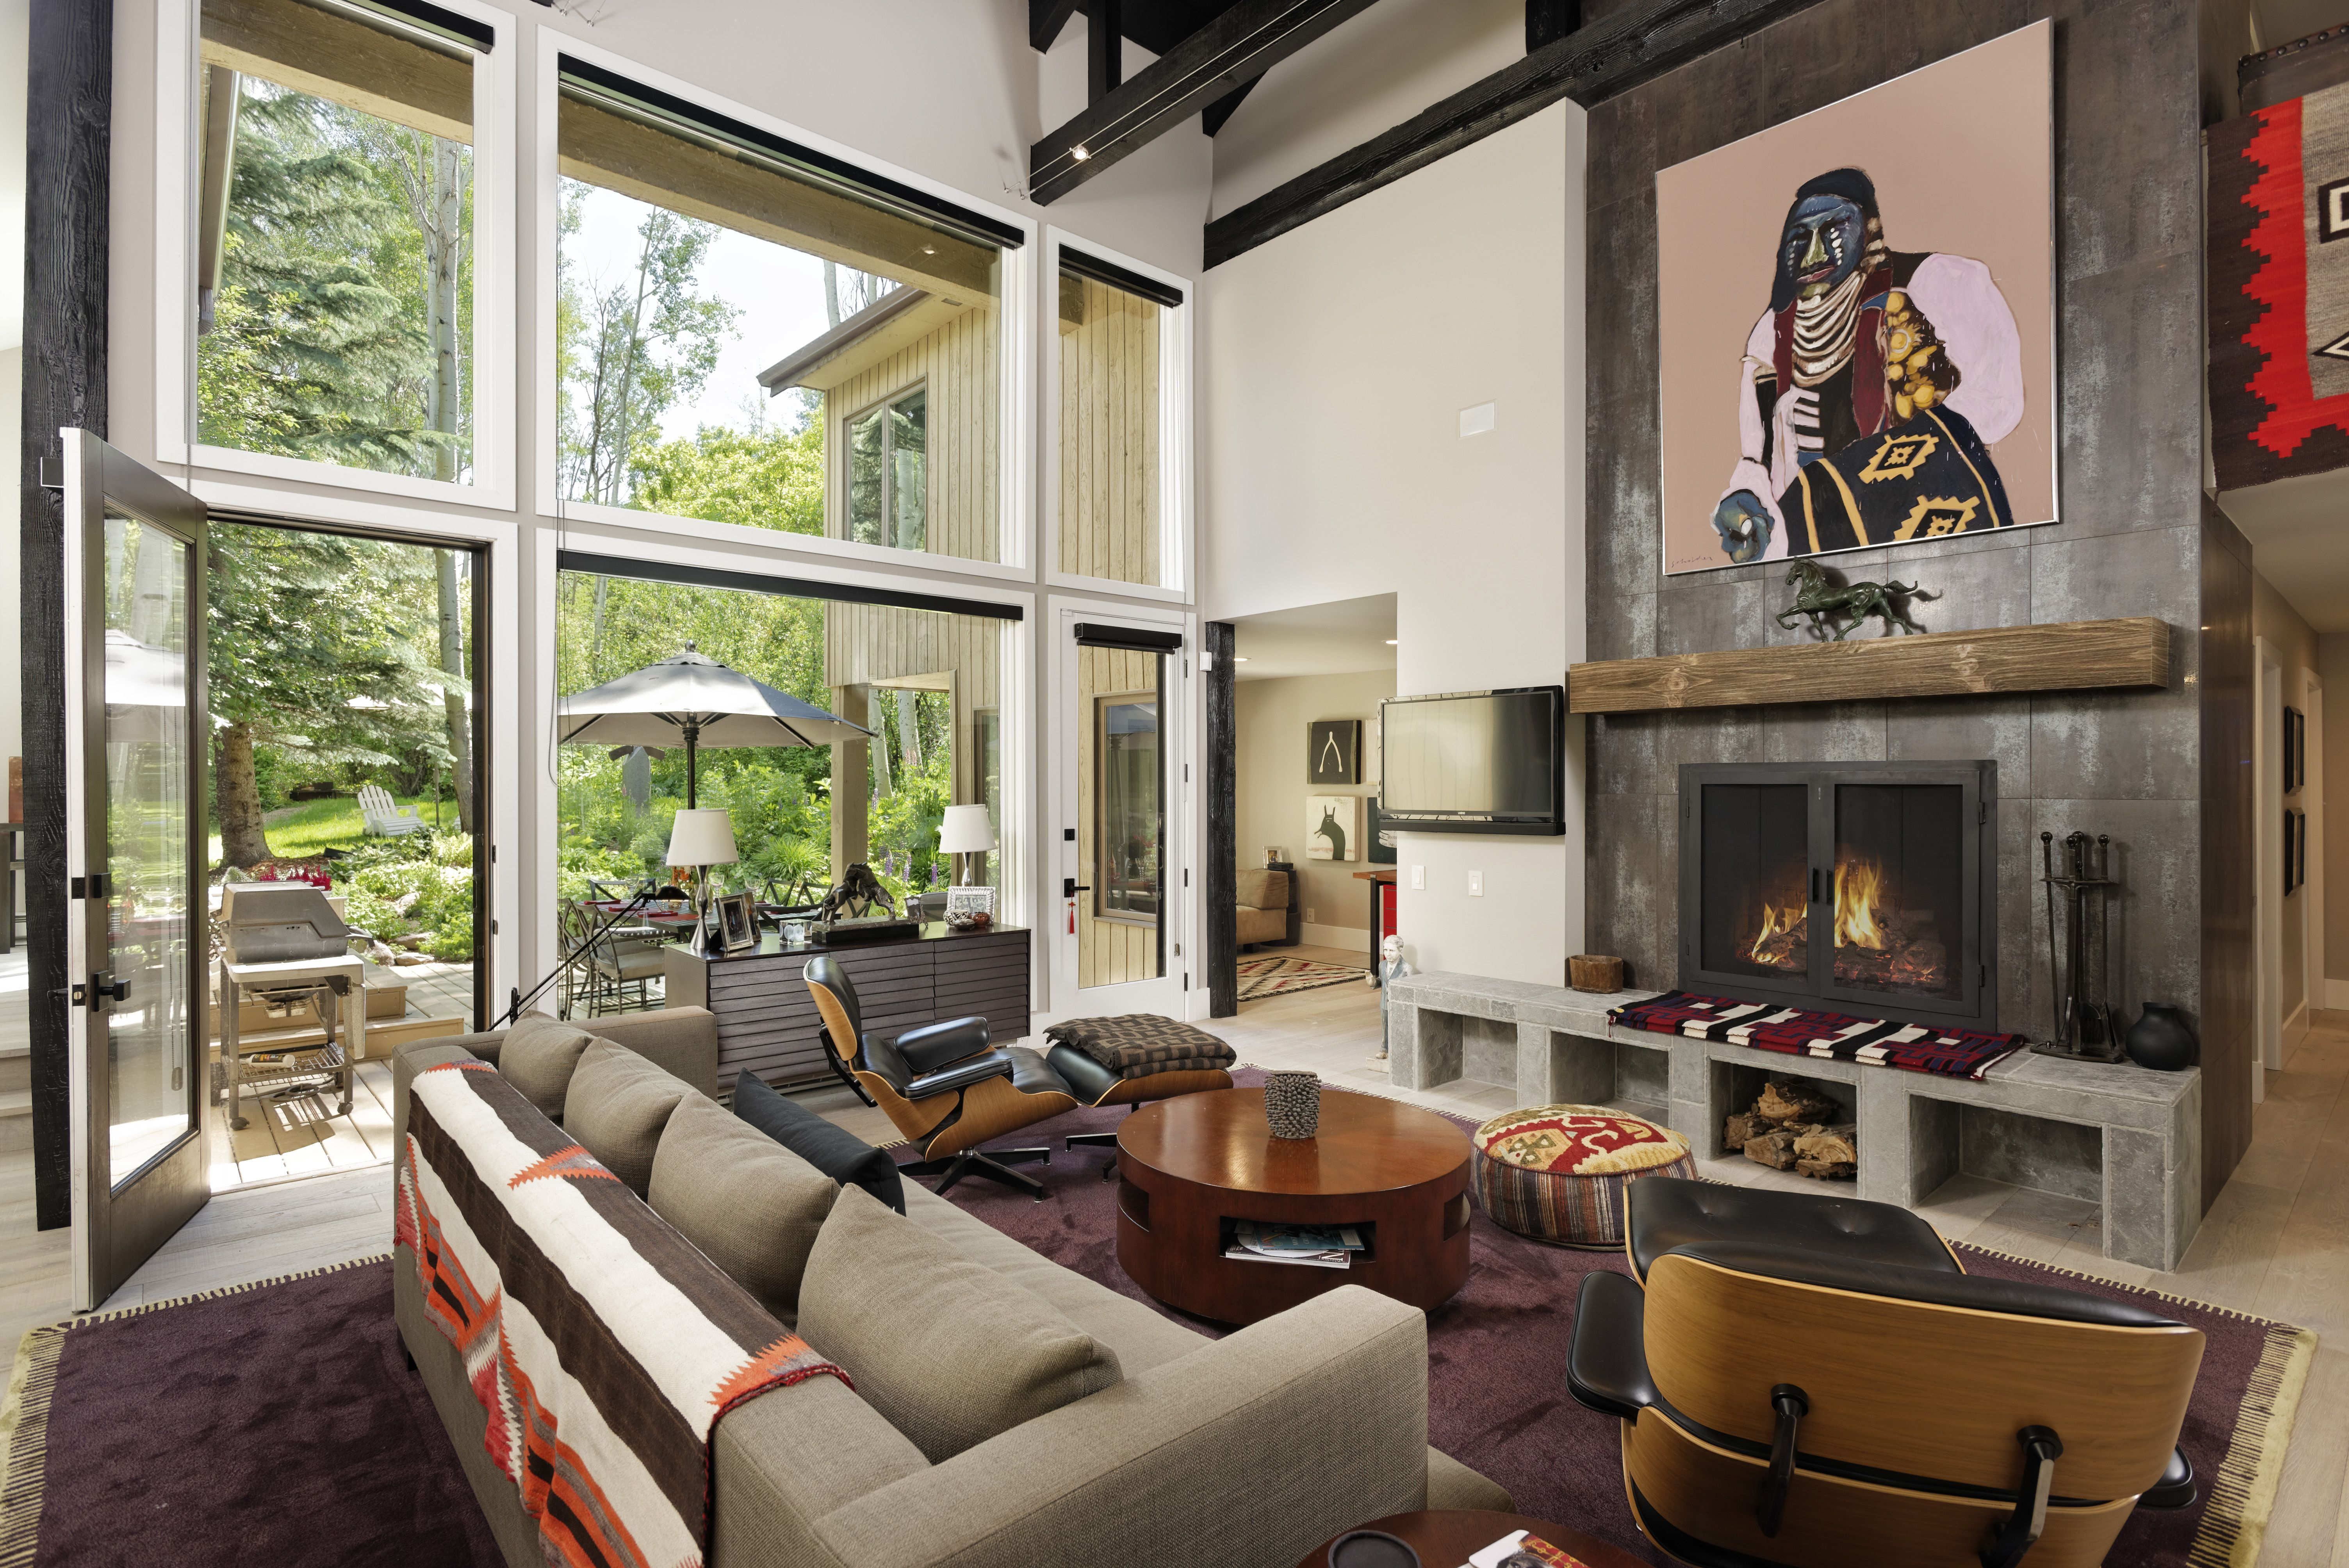 Residential/Remodel Aspen, Colorado 2019 Residential